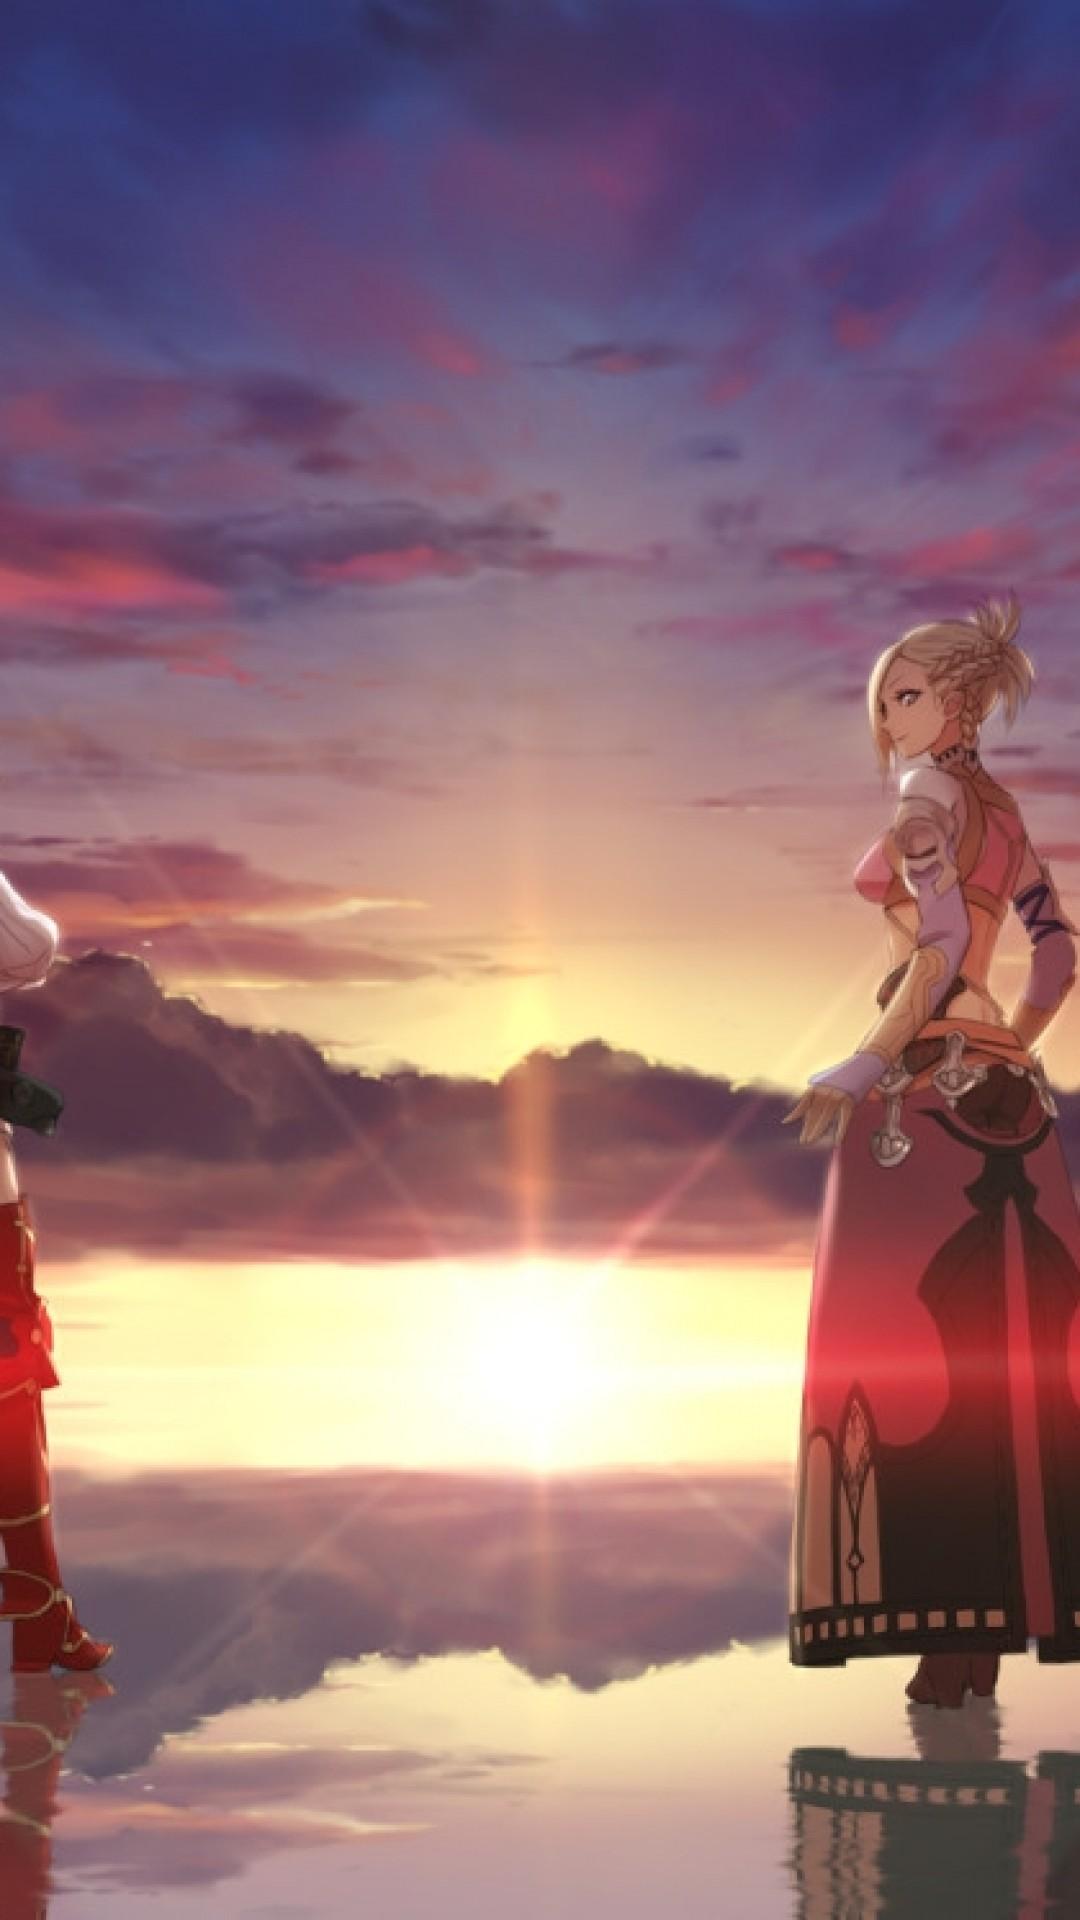 Final Fantasy Phone Wallpaper 73 Images